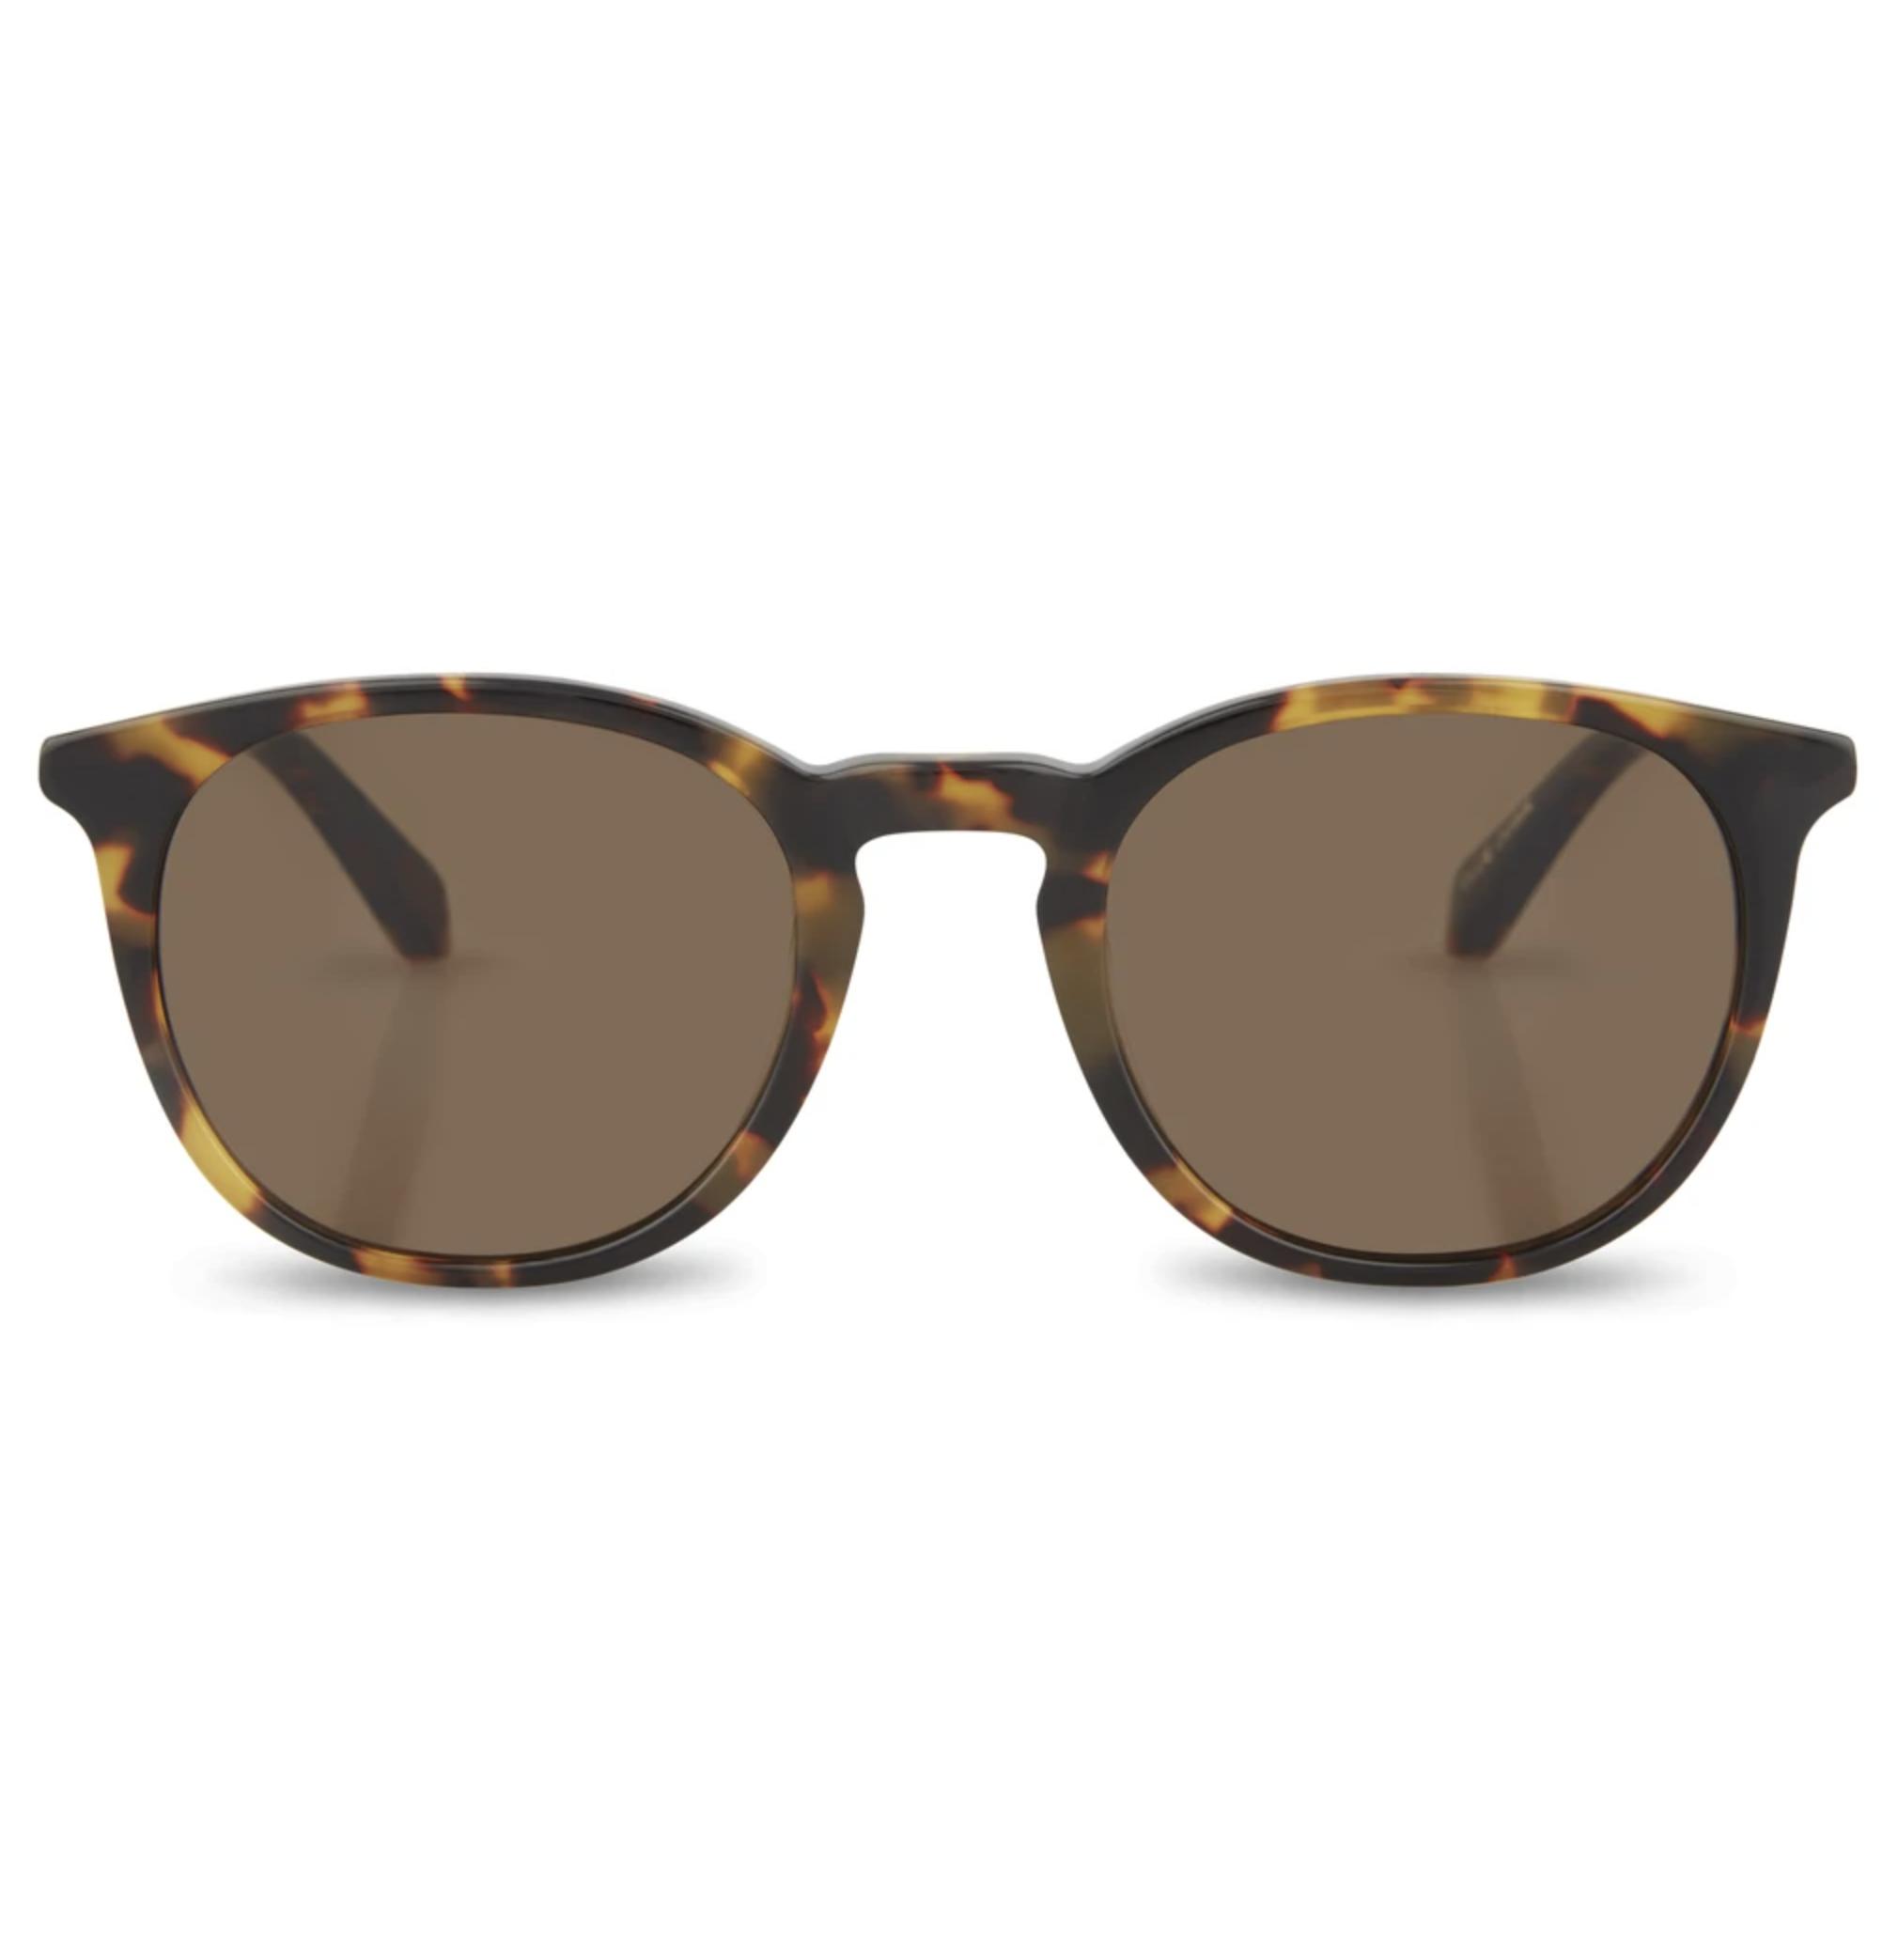 ollie-quinn--sunglasses-ss-21-edit